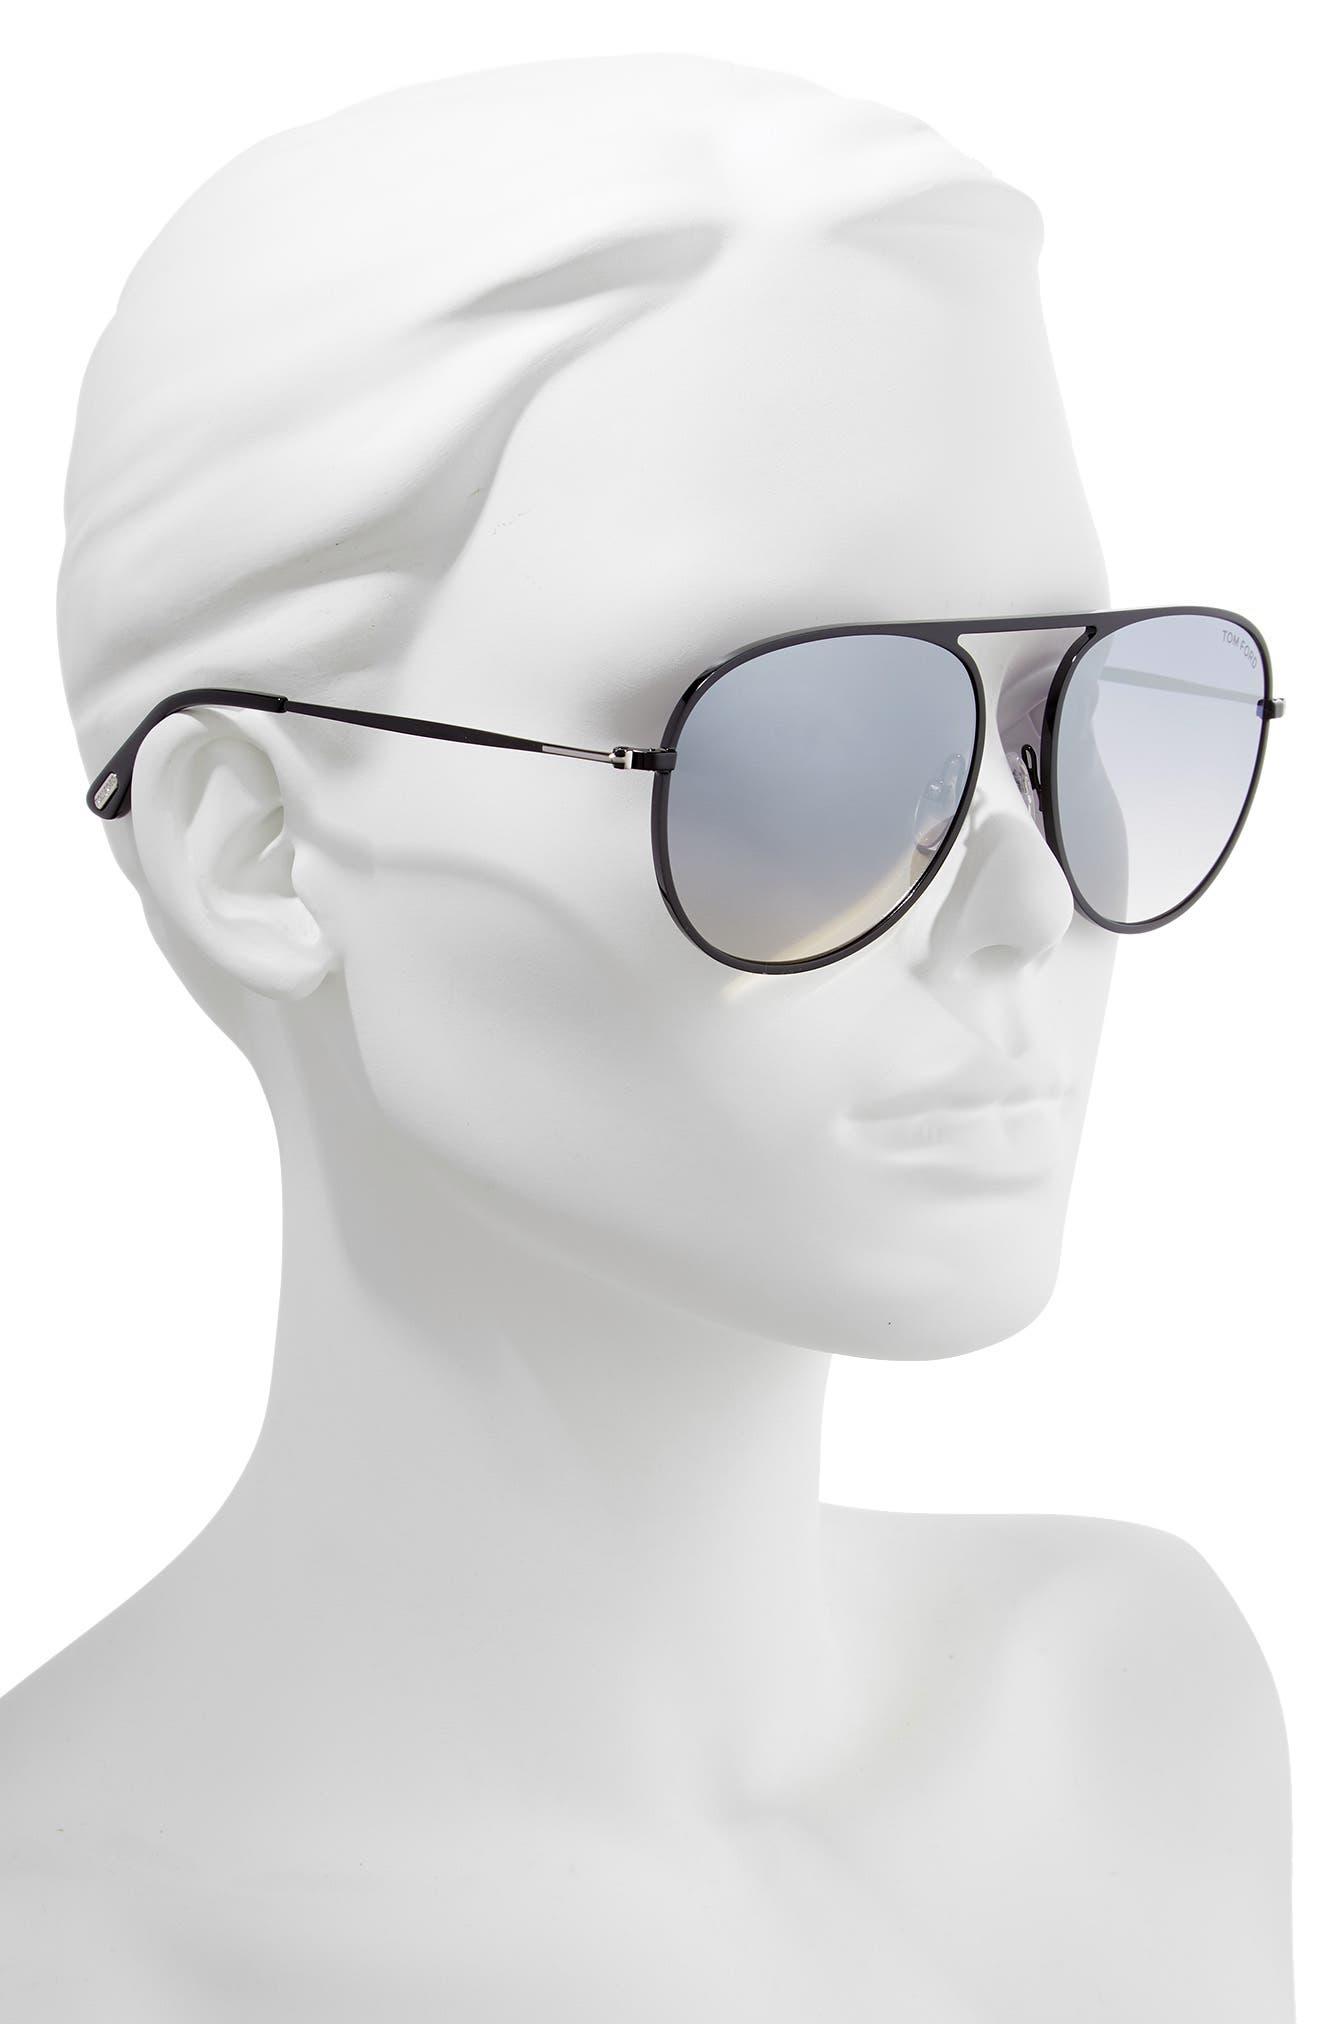 59mm Aviator Sunglasses,                             Alternate thumbnail 2, color,                             SHINY BLACK/ SMOKE MIRROR